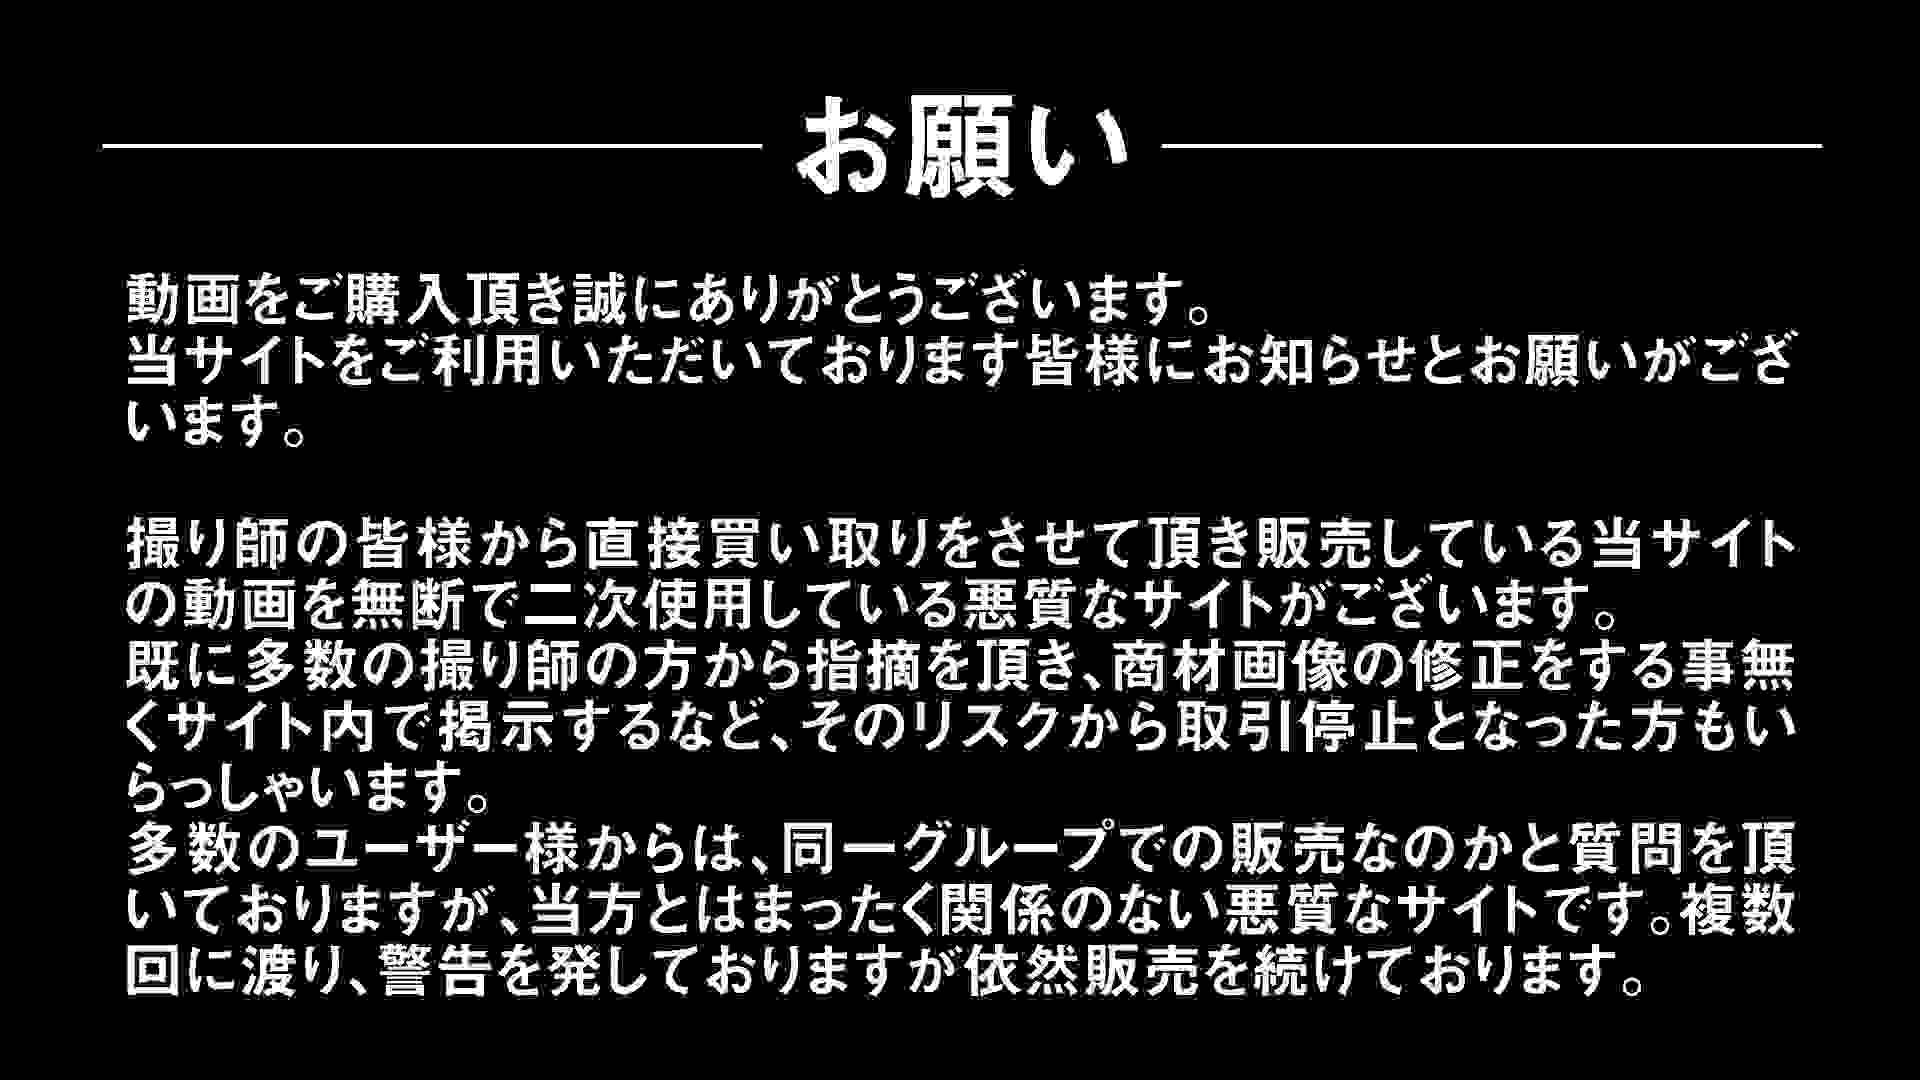 Aquaな露天風呂Vol.296 盗撮シリーズ   露天風呂編  102PIX 5